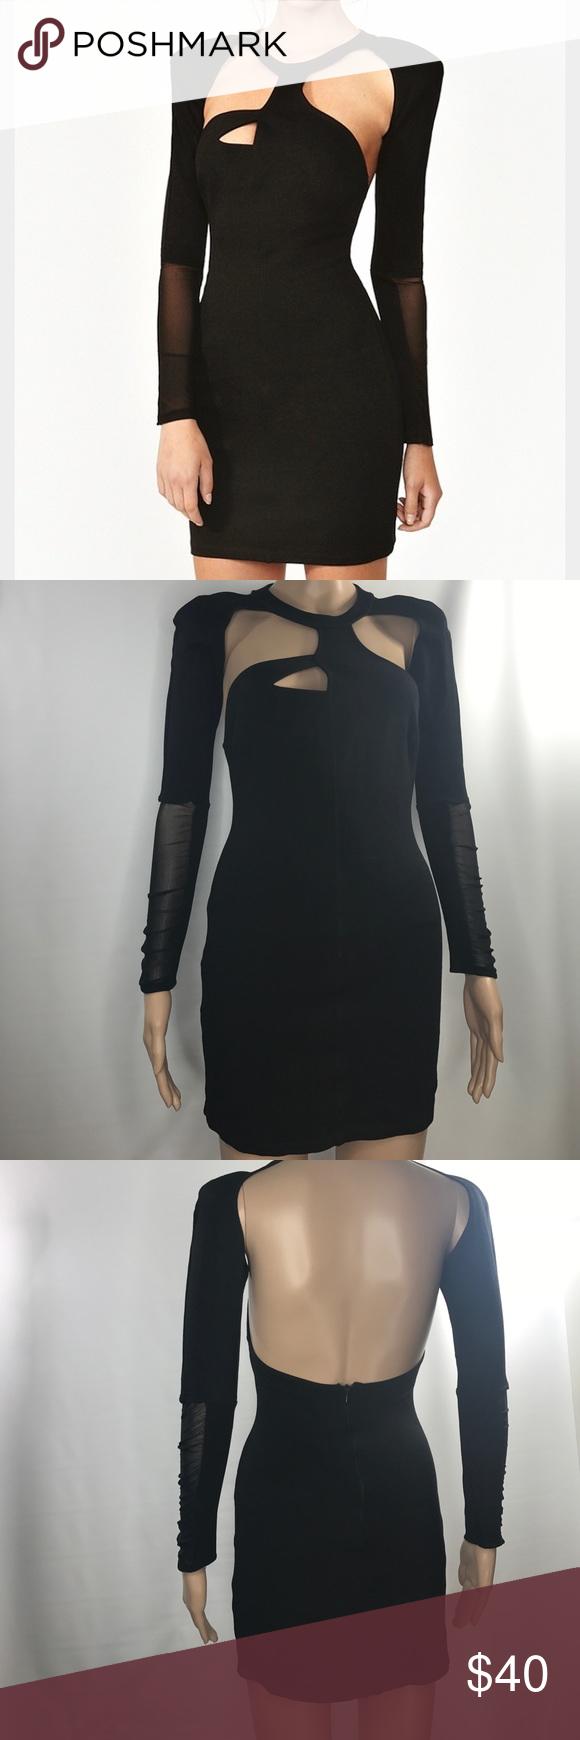 Hacker cocktail dress